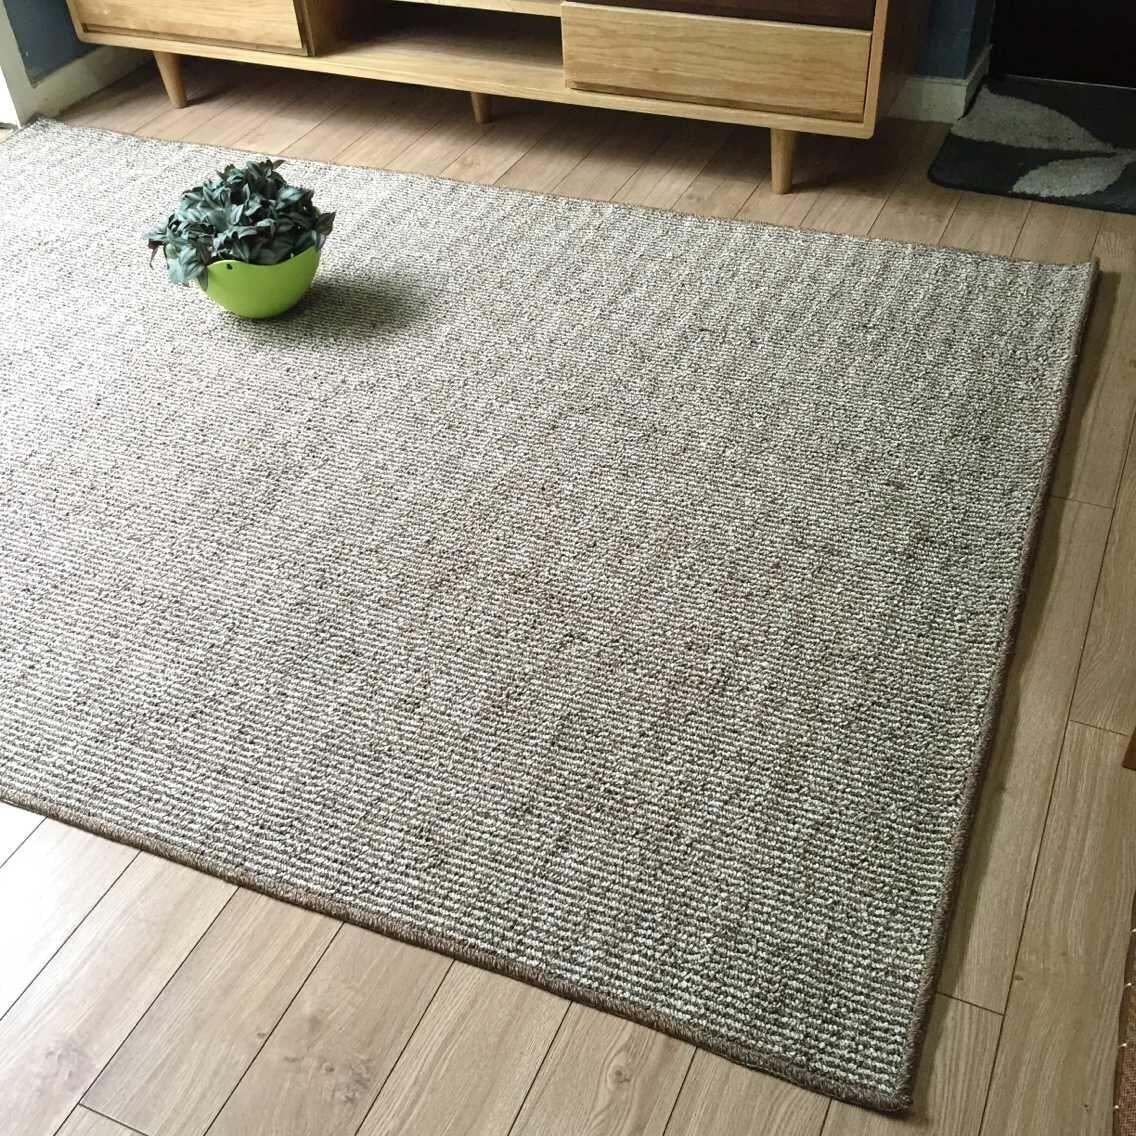 Japanese Custom Striped Simple Plain Tufted Carpet Pad